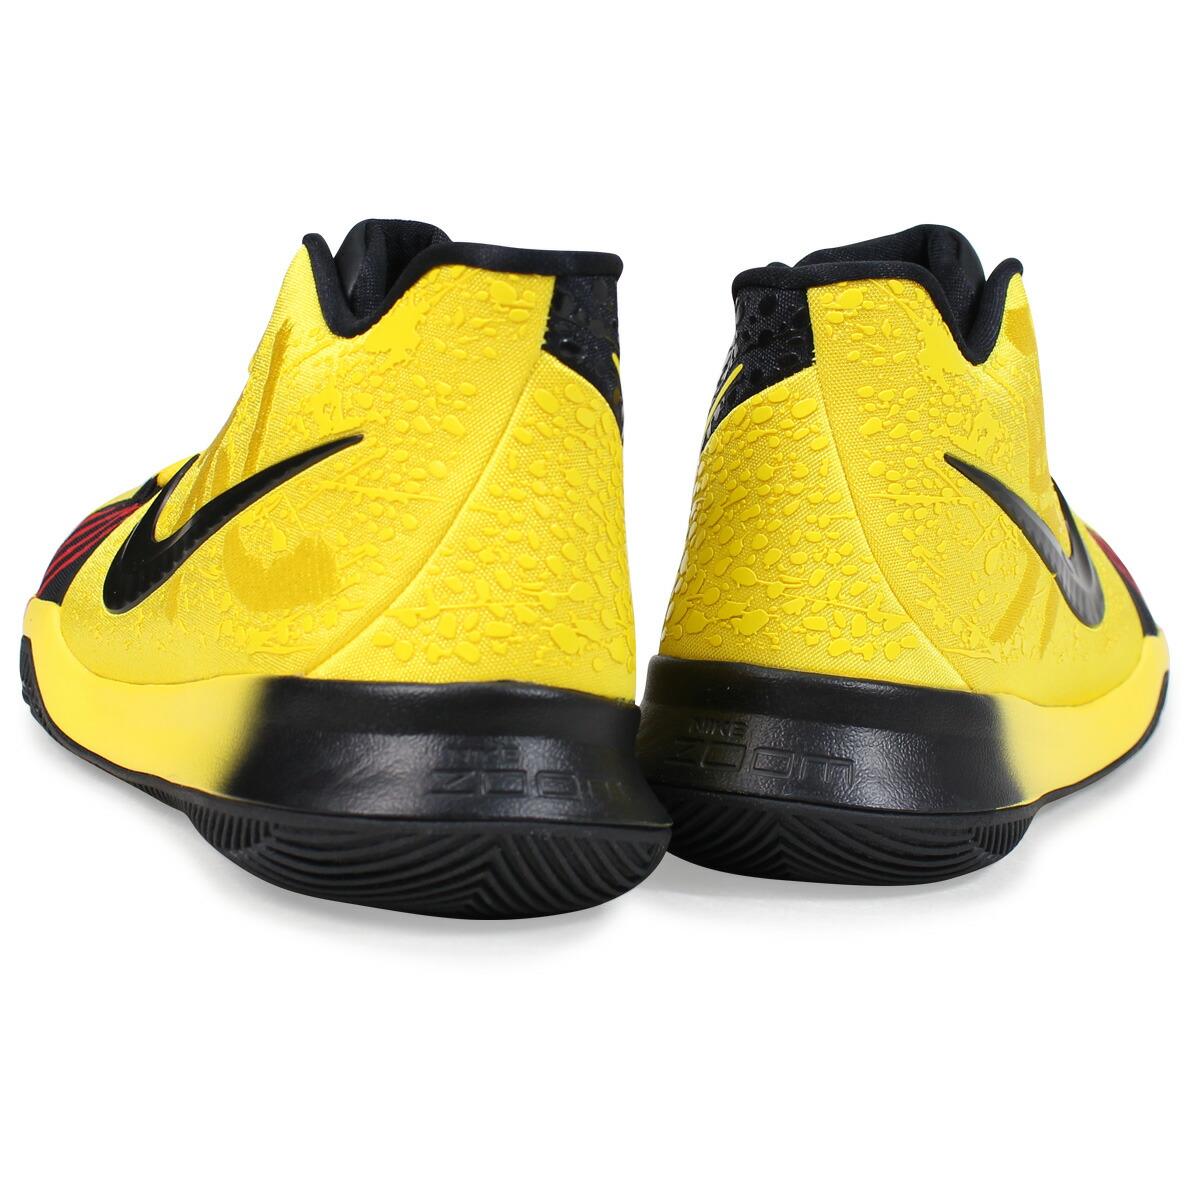 75404872e66c SneaK Online Shop  Nike NIKE chi Lee 3 sneakers men KYRIE 3 MAMBA ...